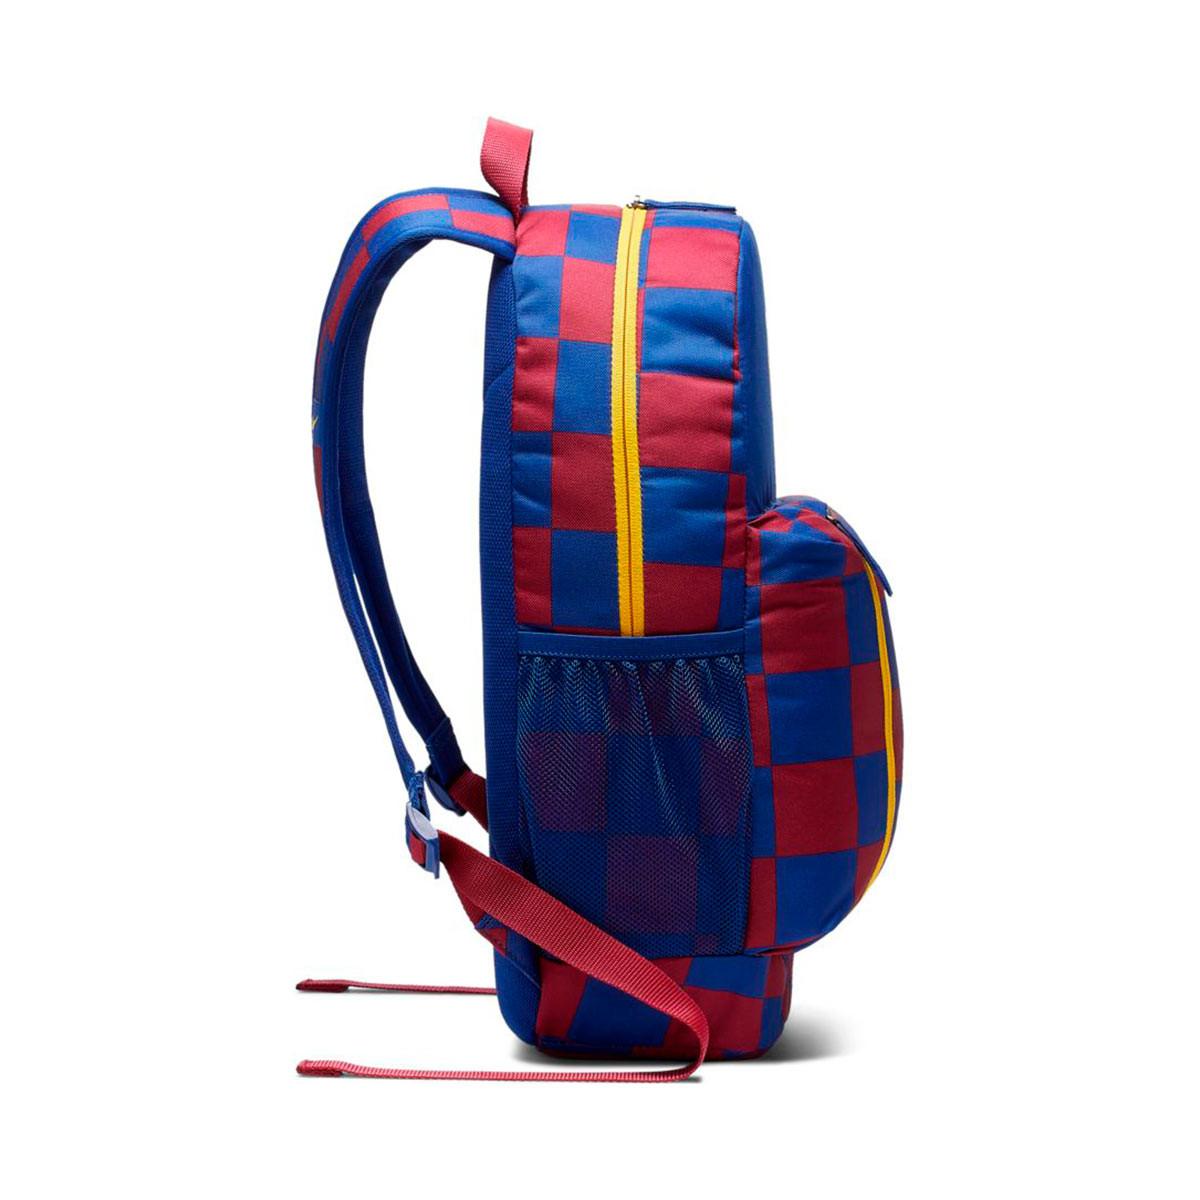 c231882f03e3 Mochila FC Barcelona Stadium 2019-2020 Deep royal blue-Noble red-Varsity  maize